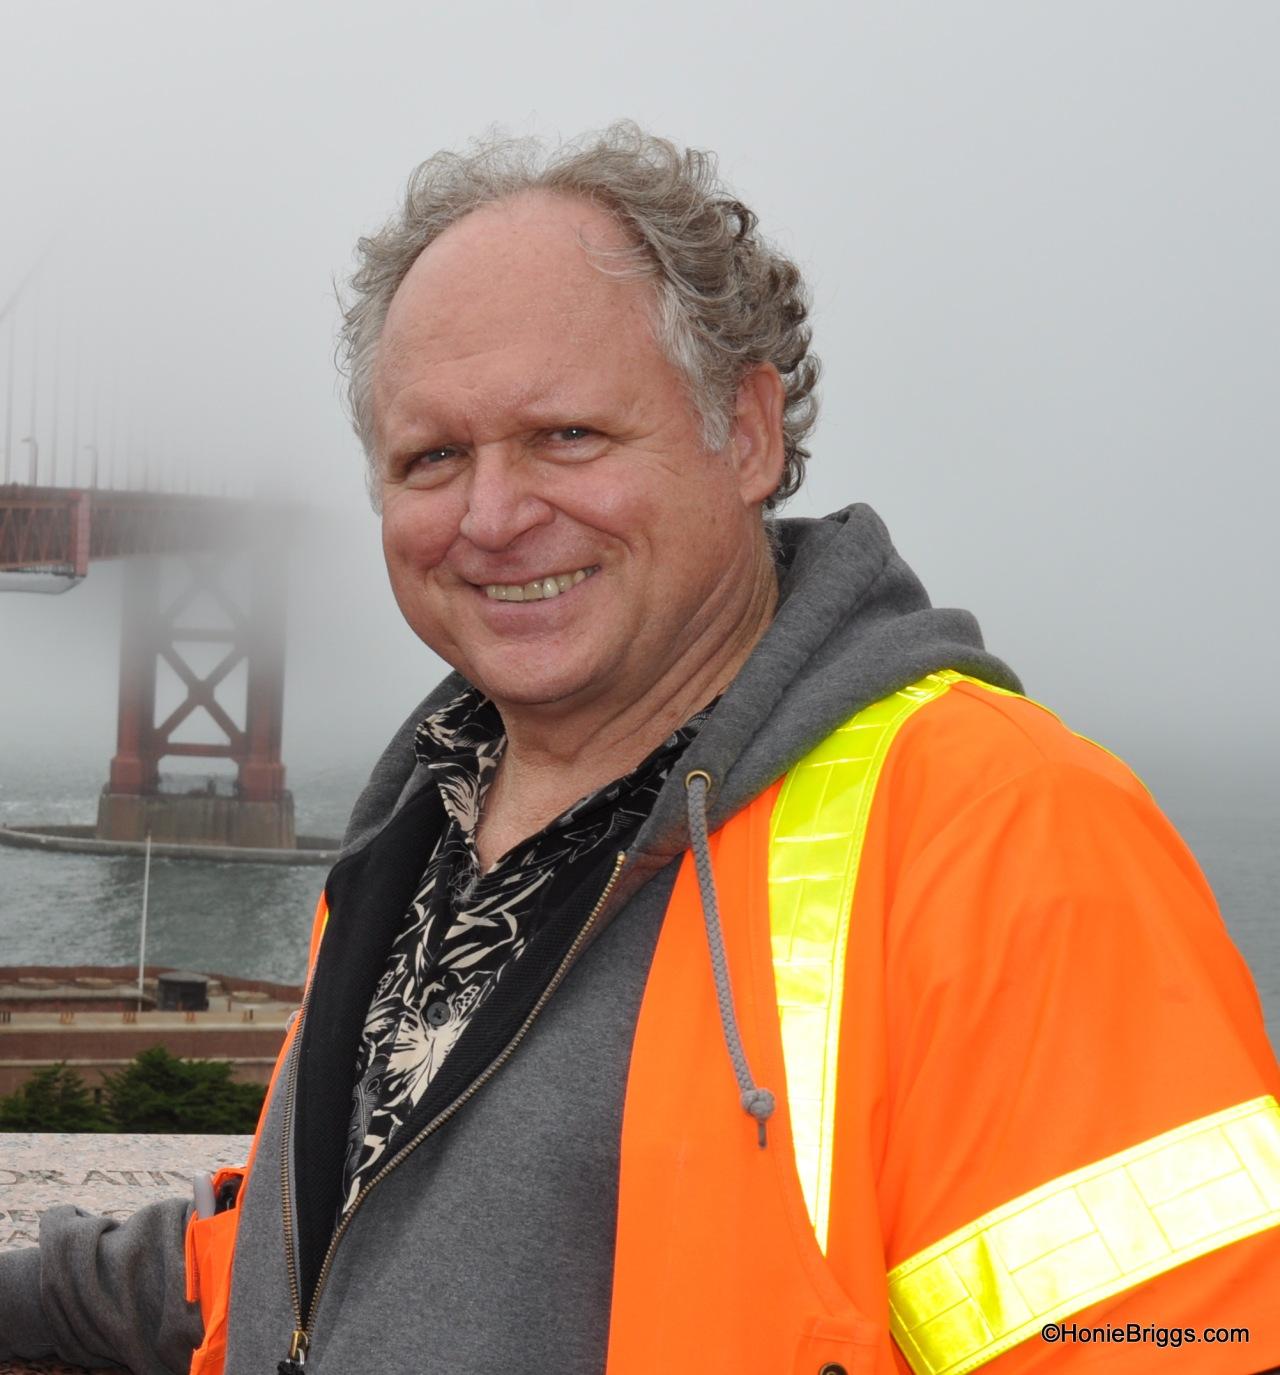 Golden Gate Ambassador, Allan Smorra